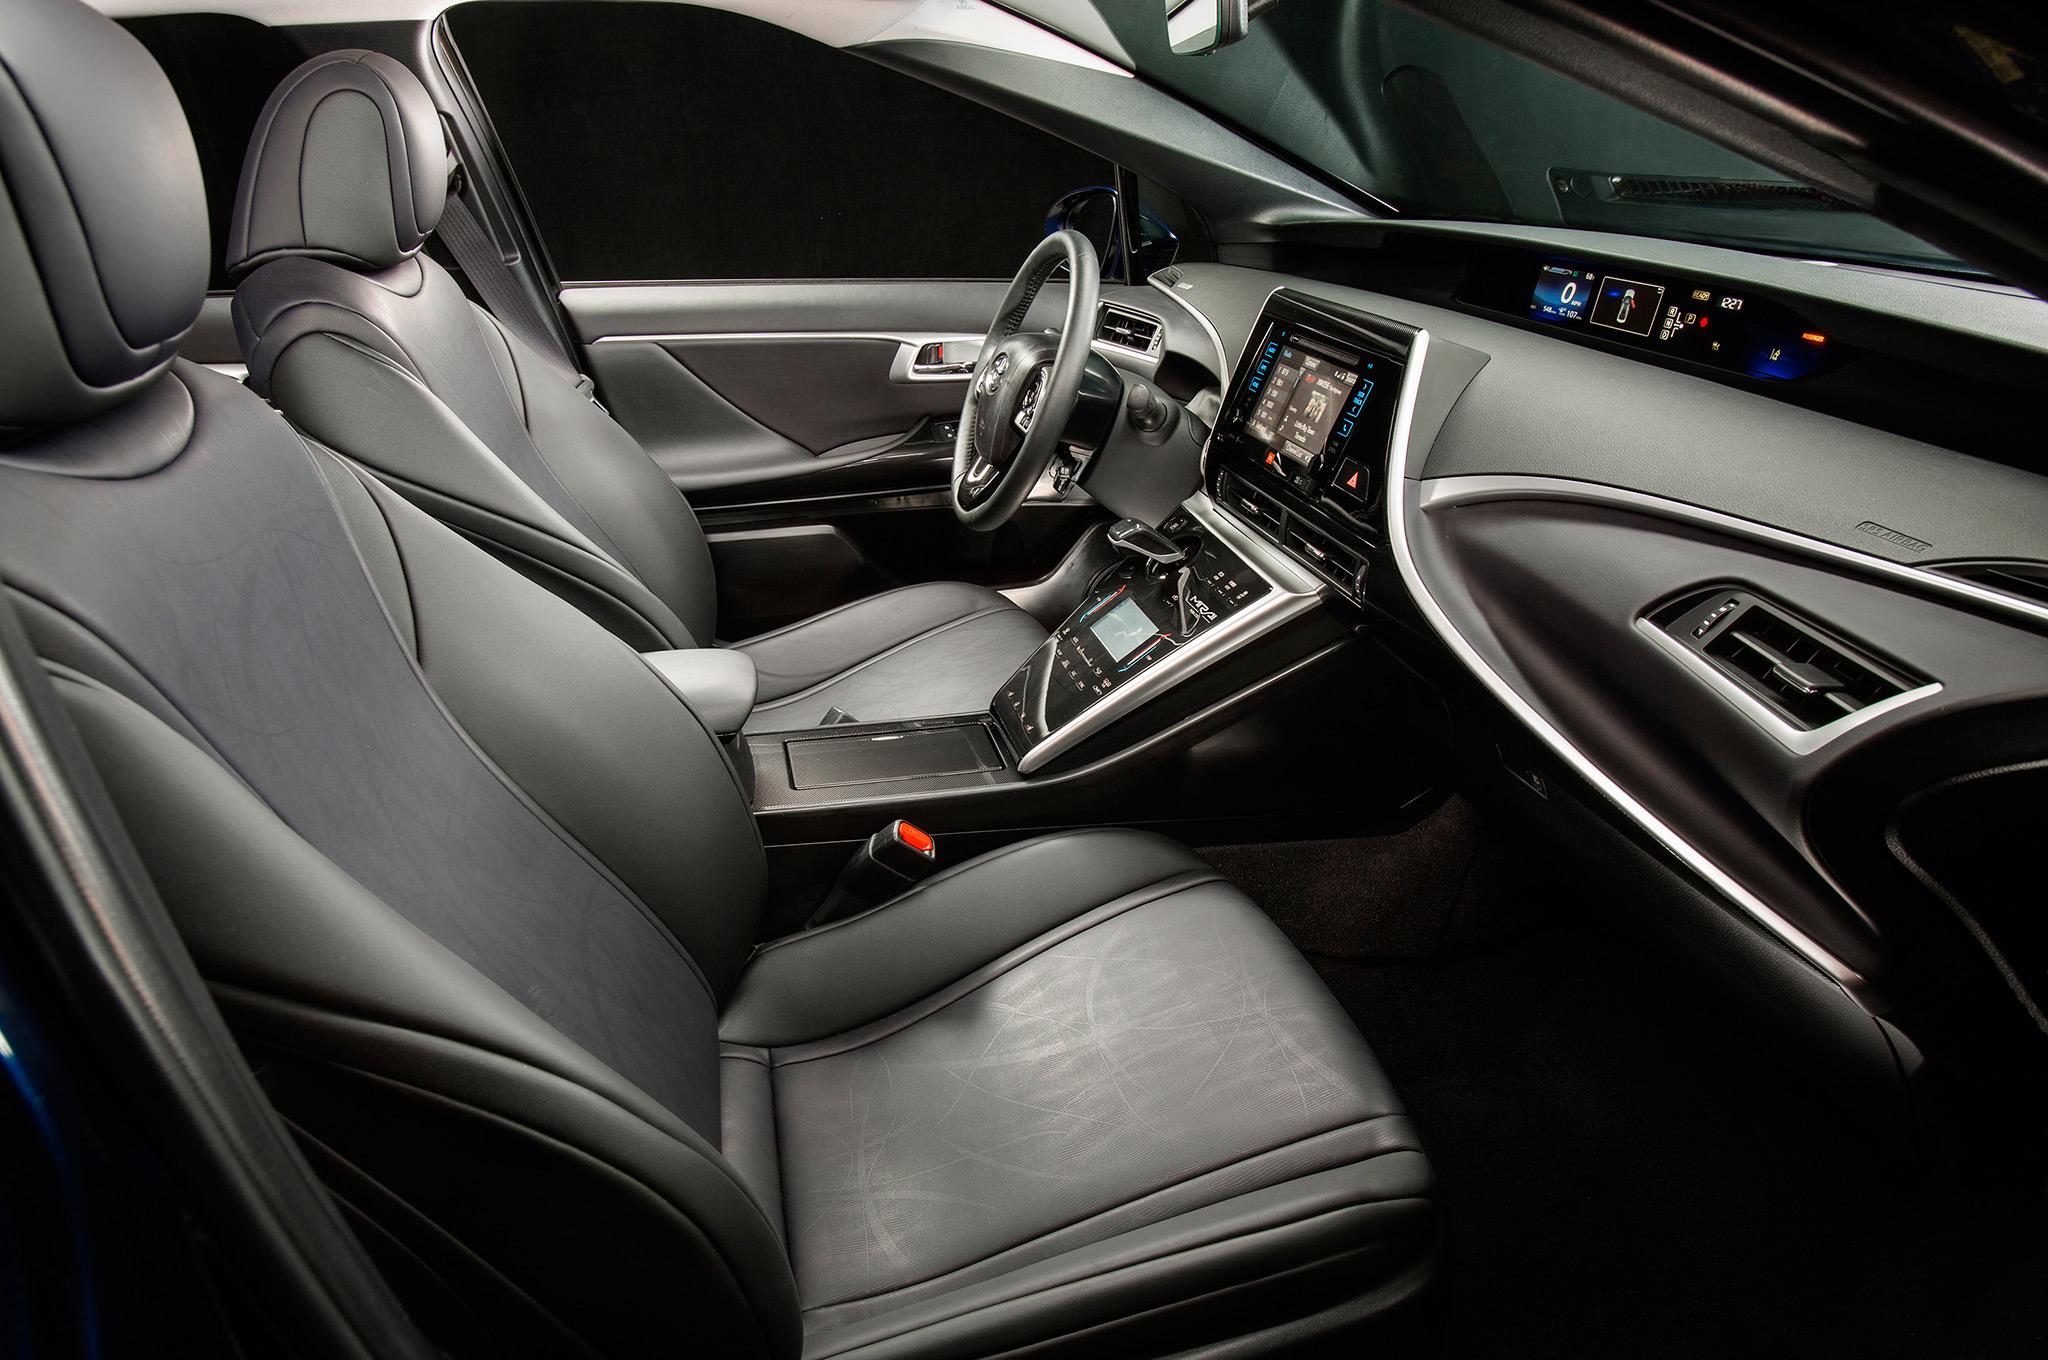 2018 Toyota Mirai interior